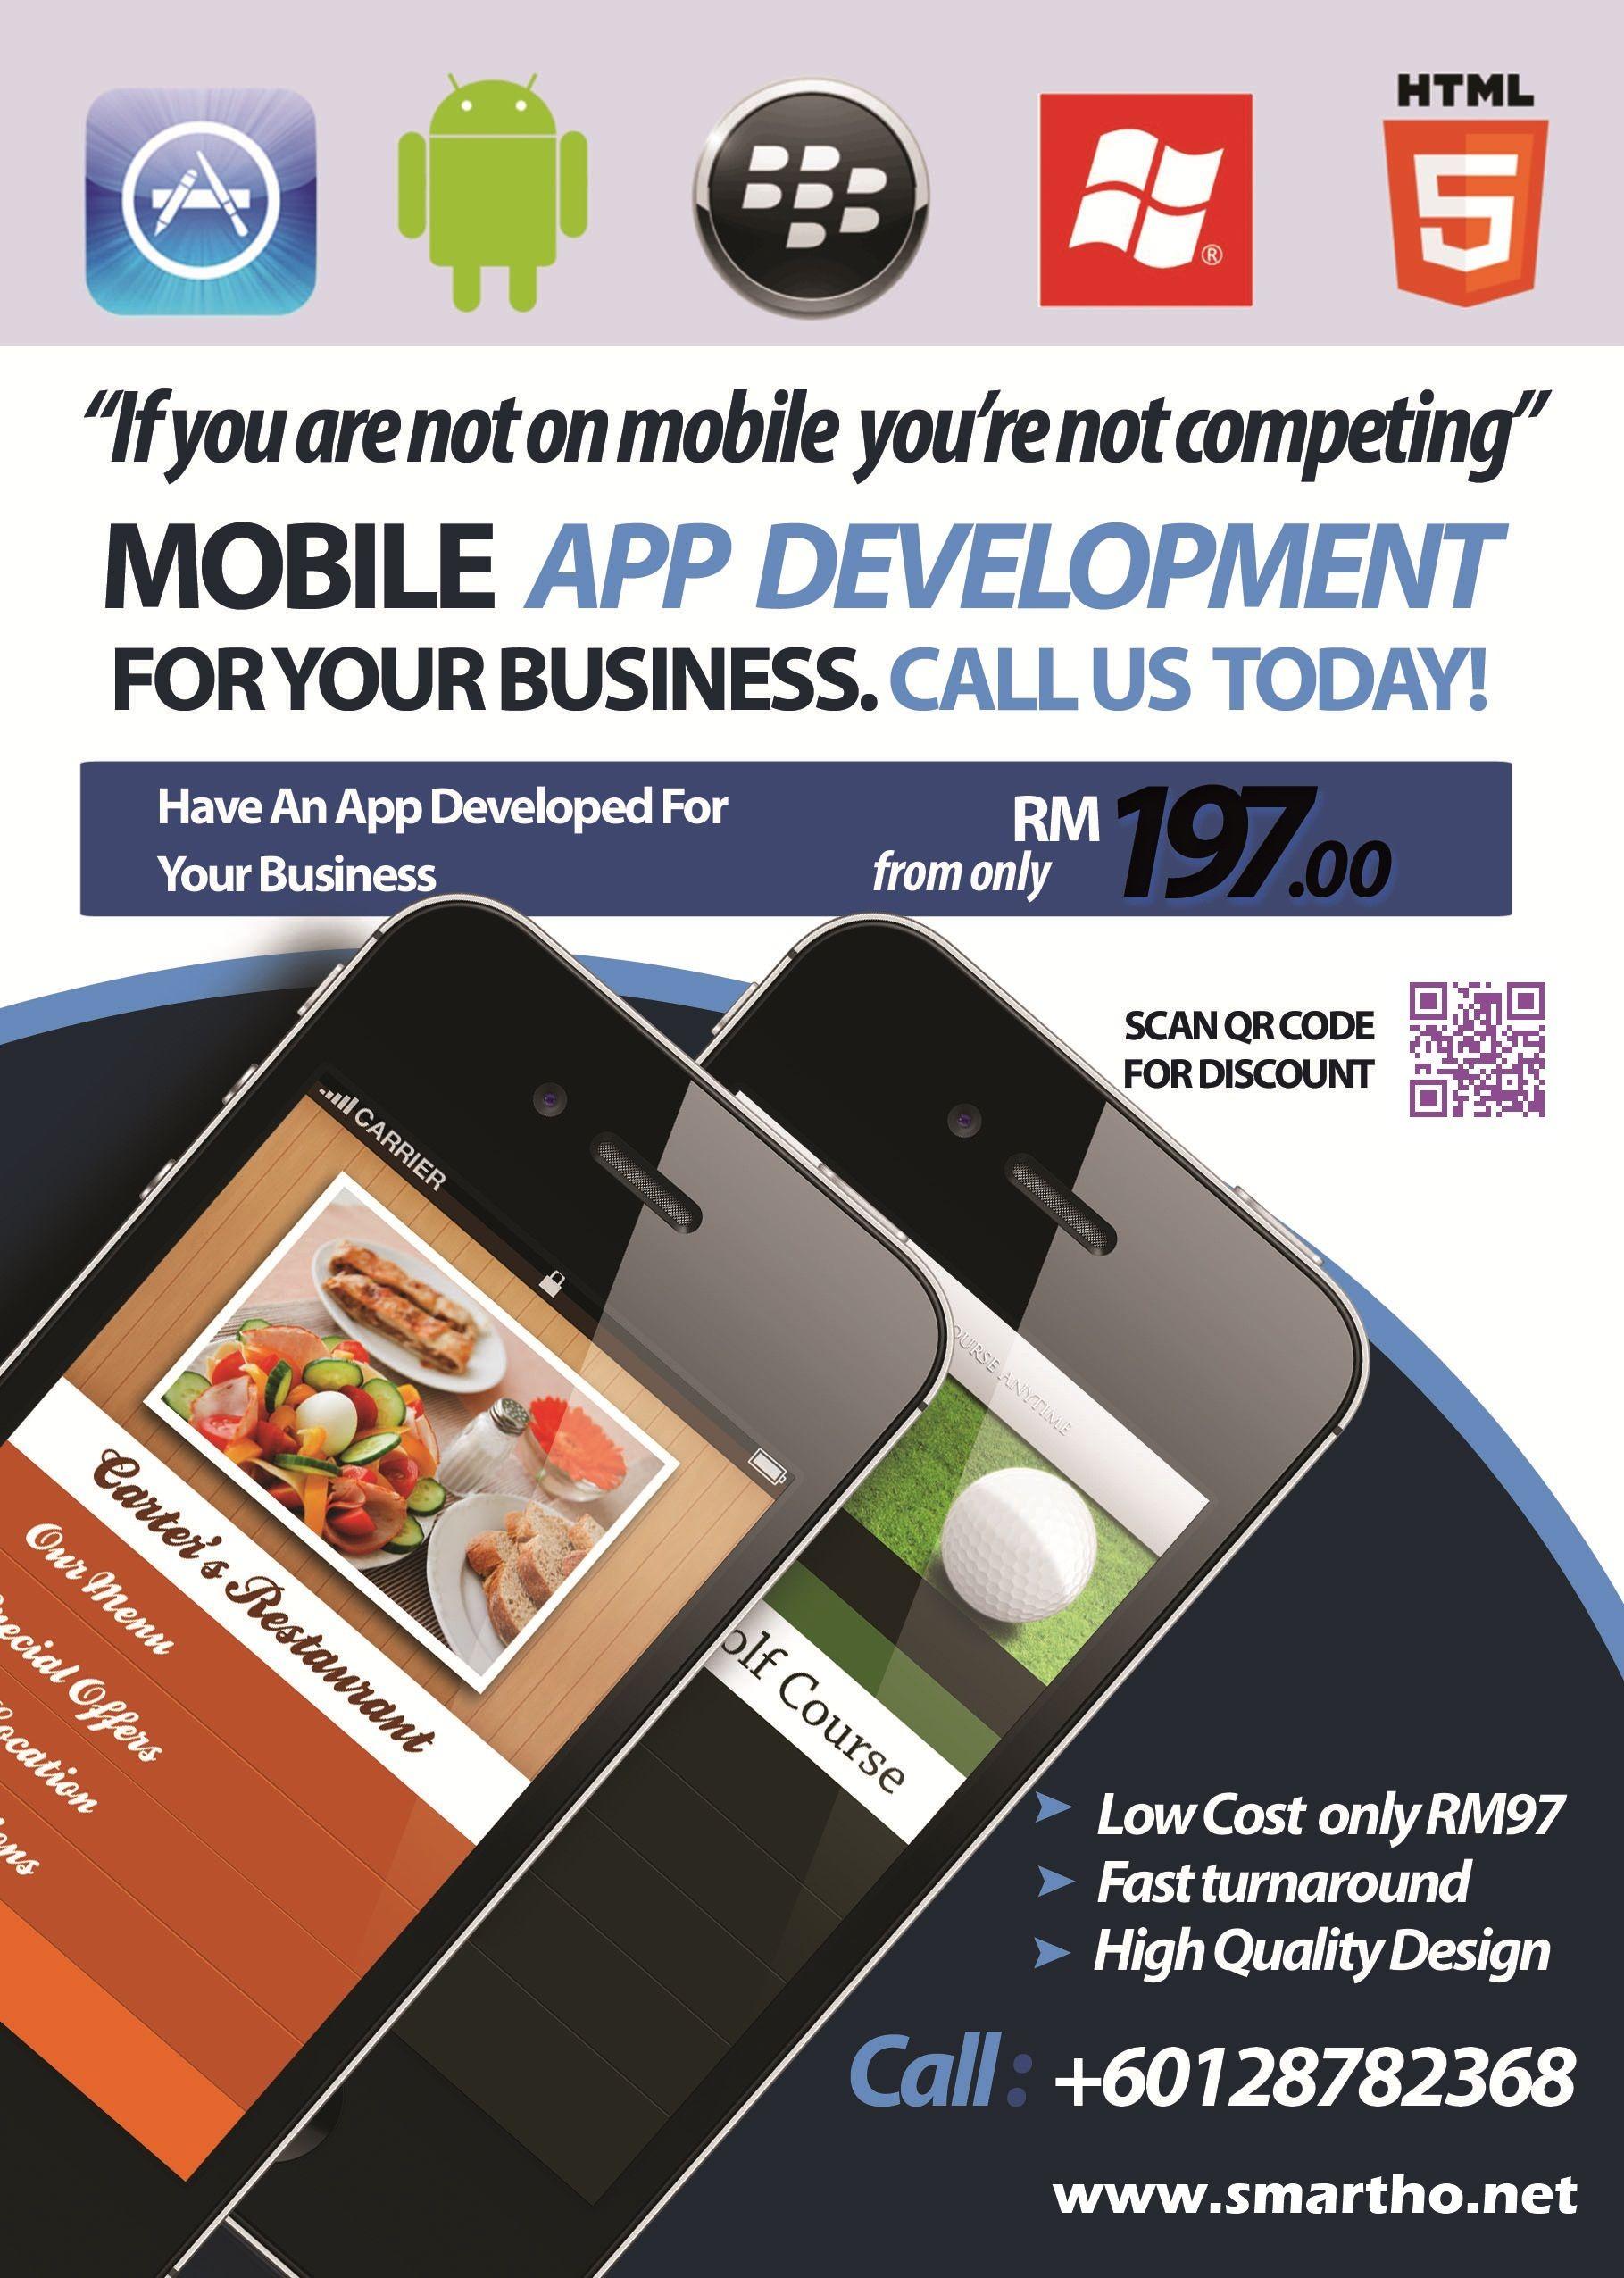 My Wordpress Website Just Another Wordpress Site Online Marketing Services App Development Mobile App Development